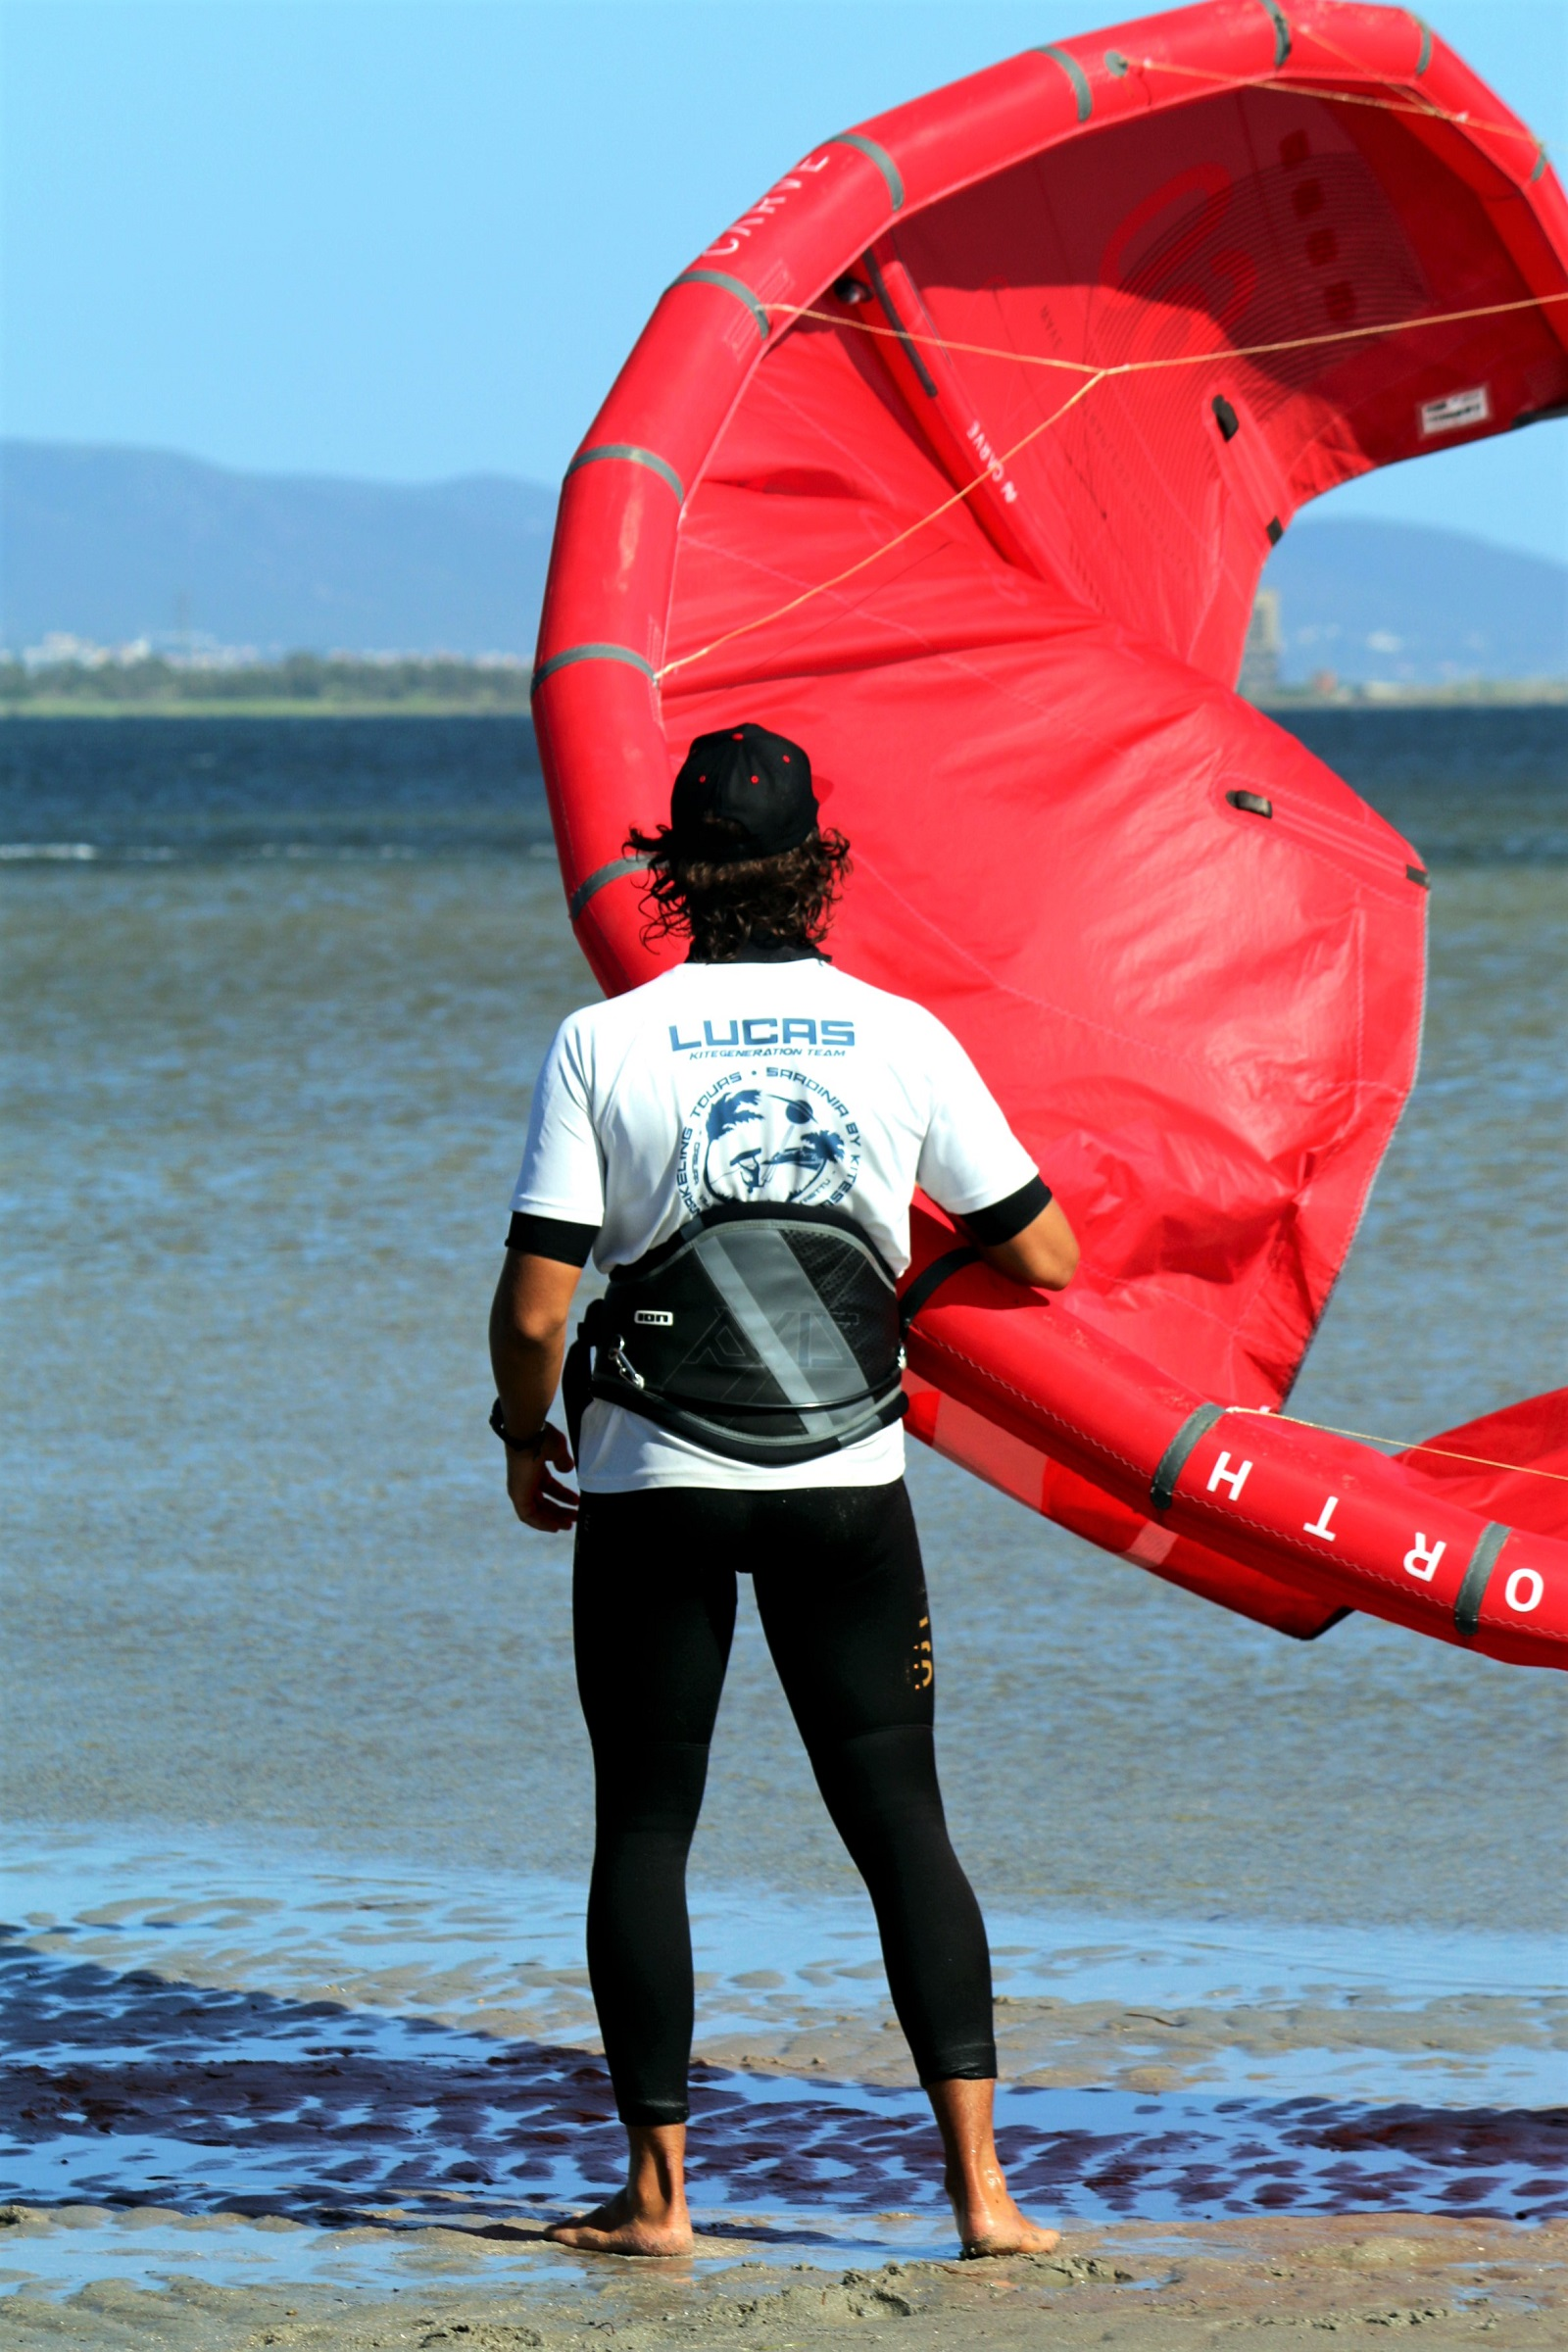 Lucas Rey, istruttore kitesurf a Punta Trettu in Sardegna